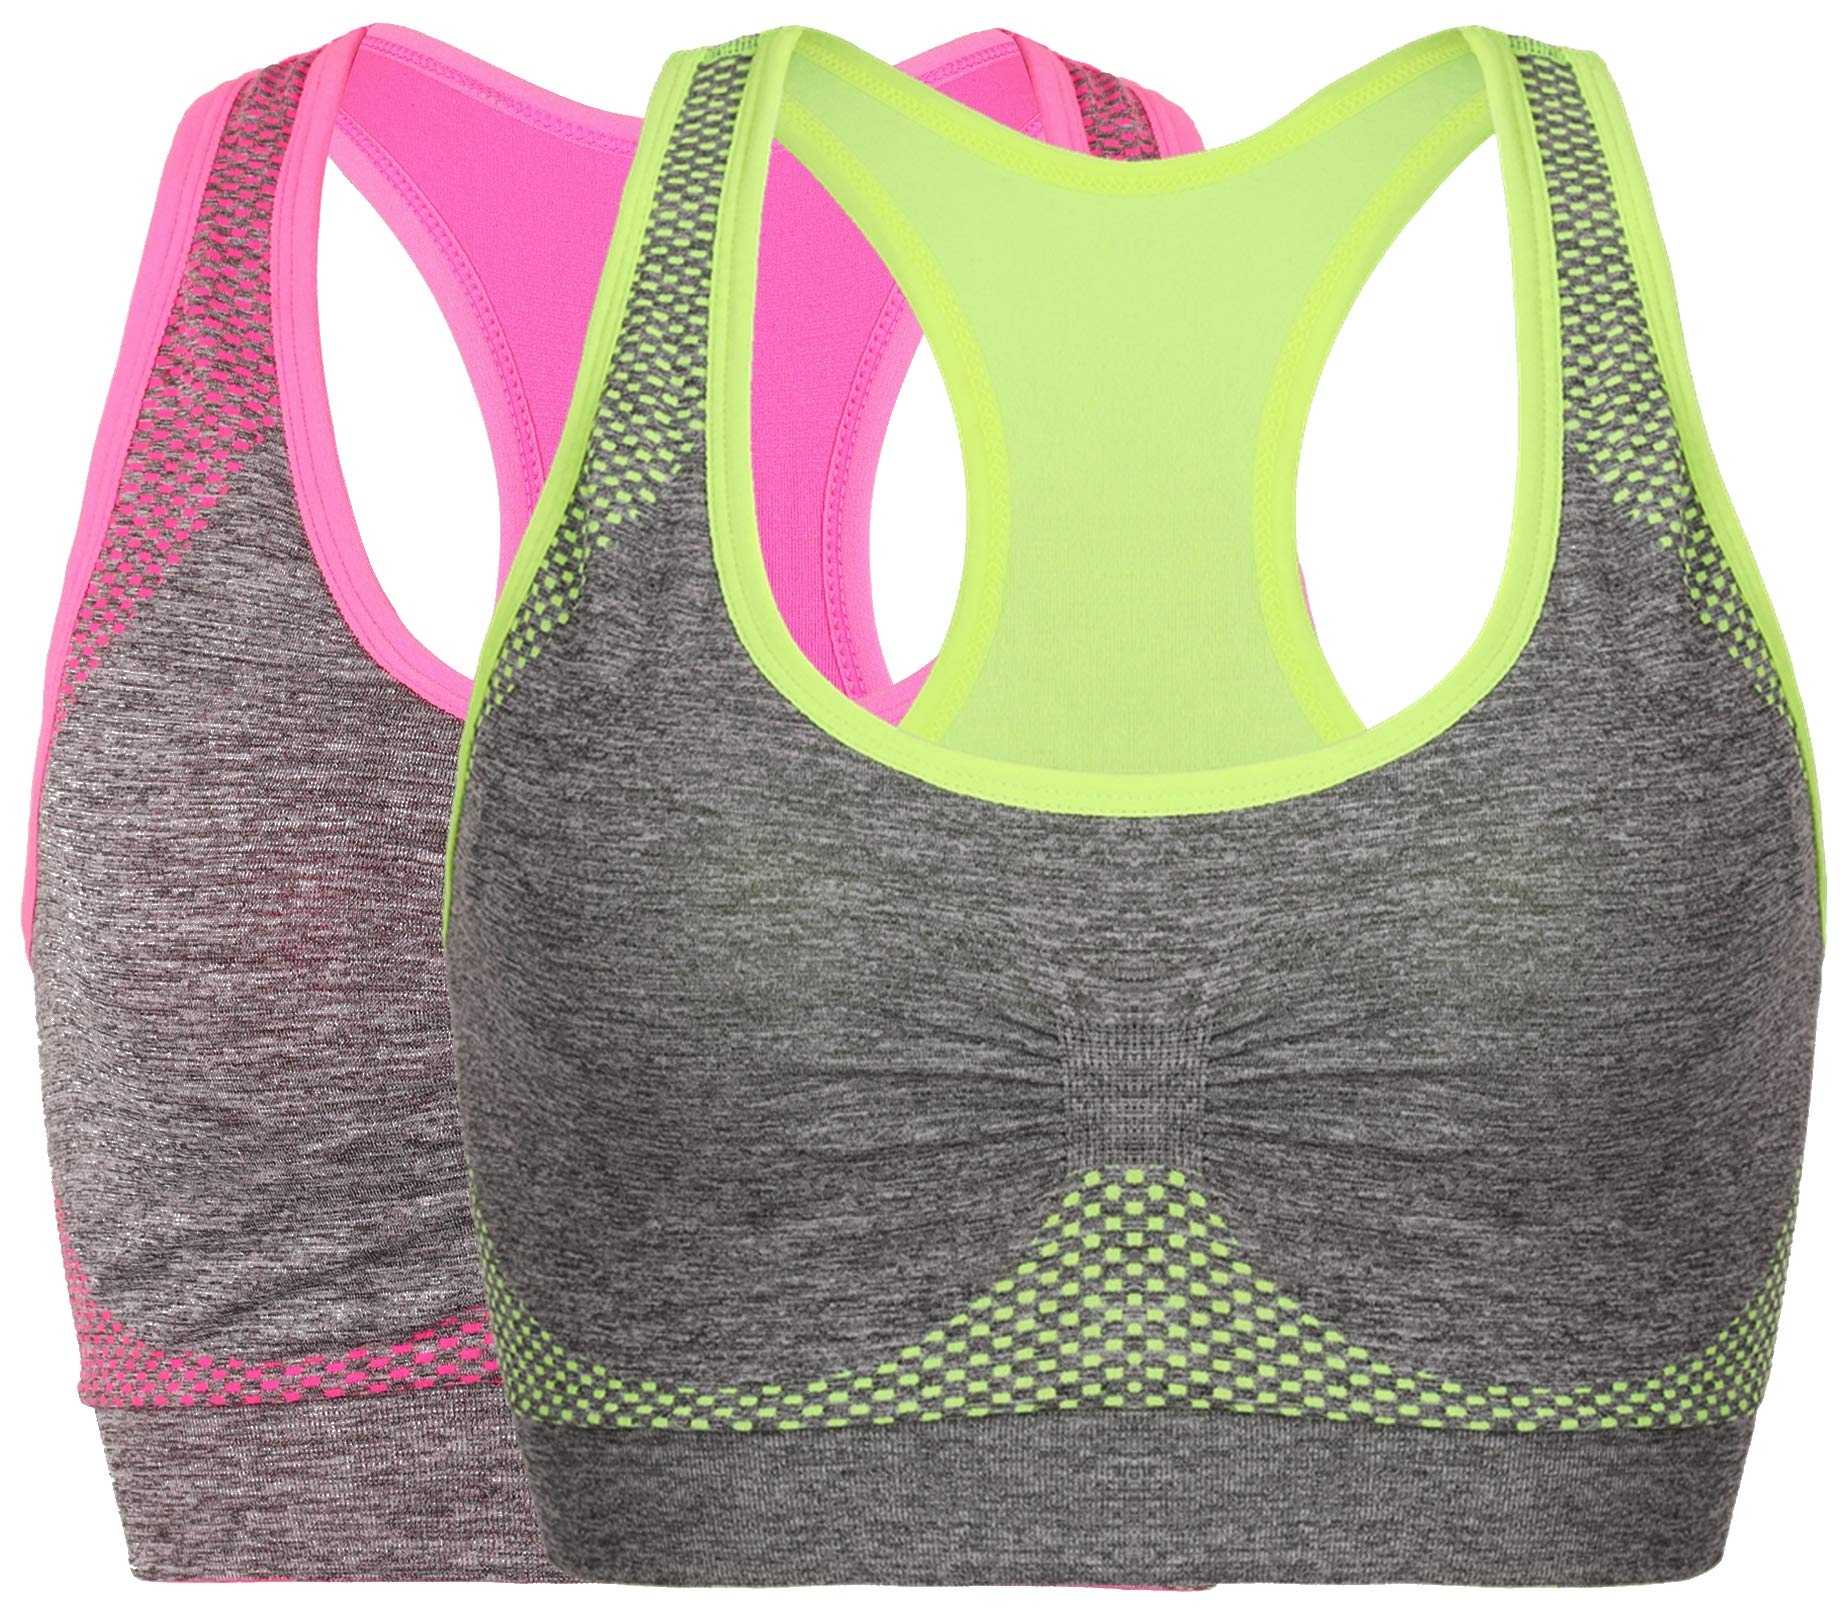 Vermilion Bird Women's Seamless Sports Bra High Impact Pocket Yoga Bras M 2 Pack